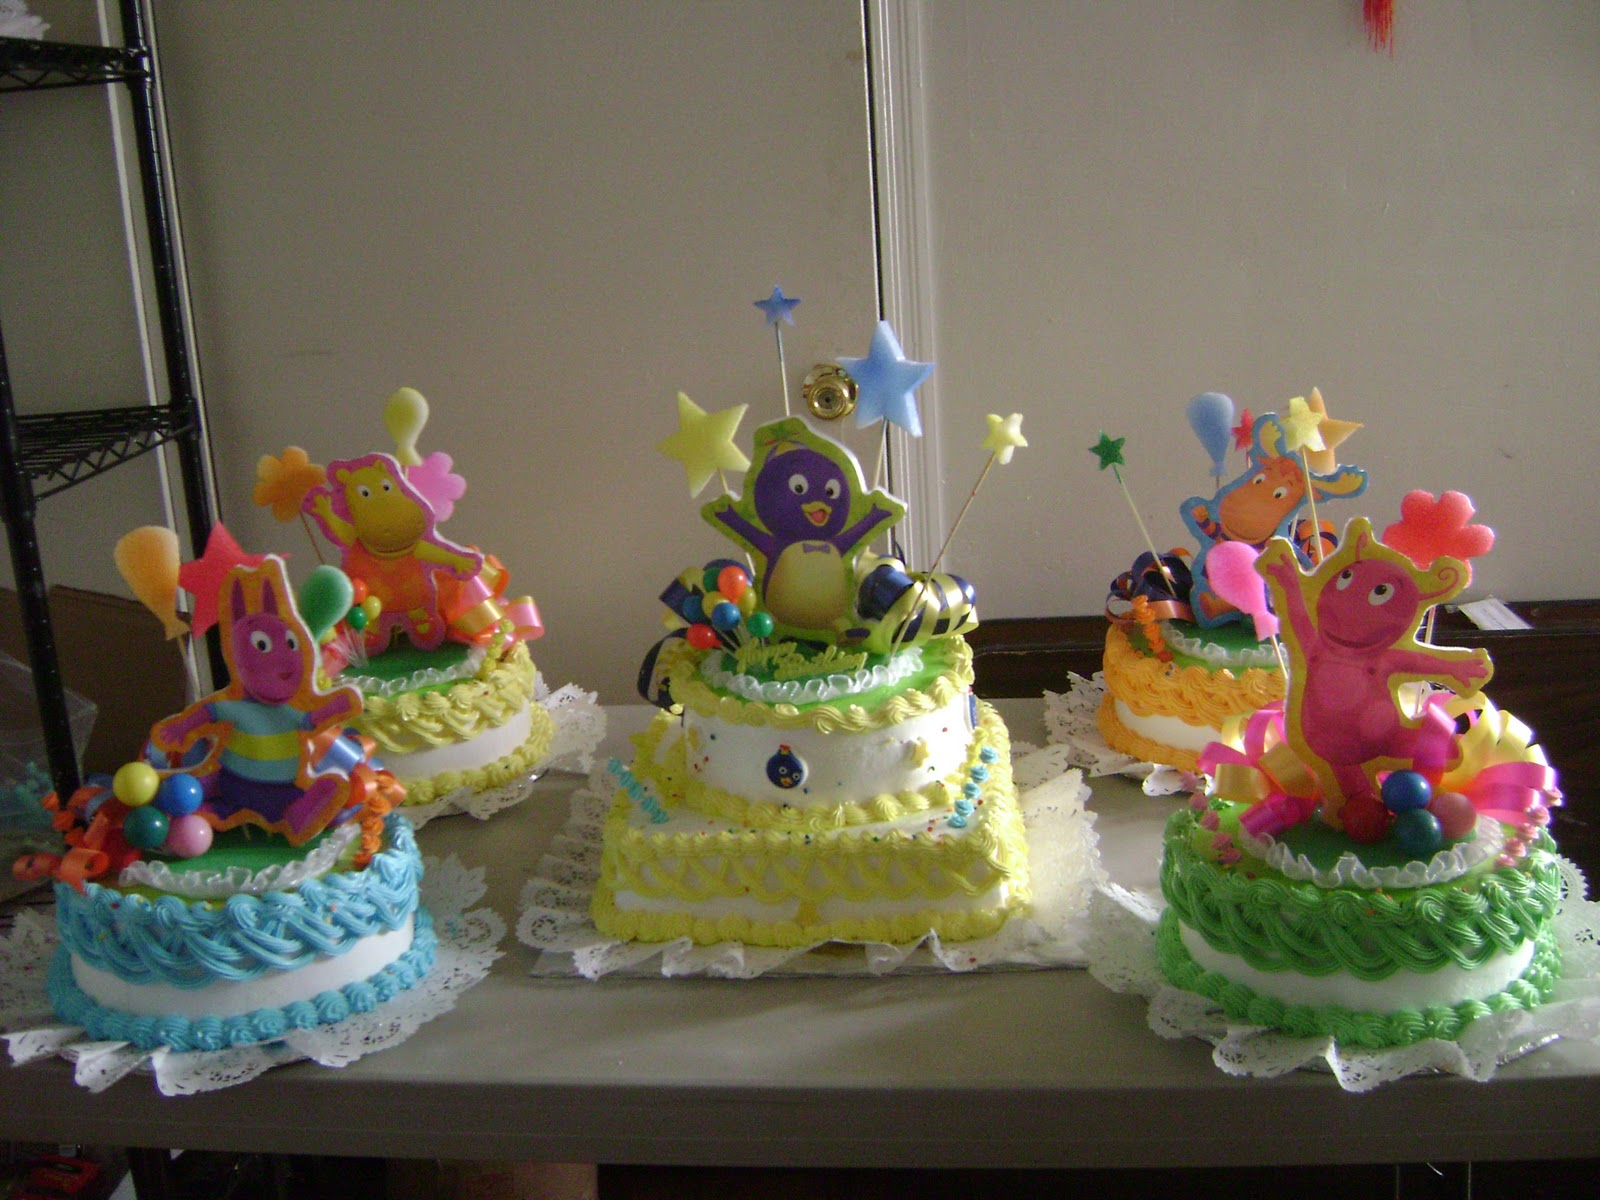 Yolandas Specialty Cakes